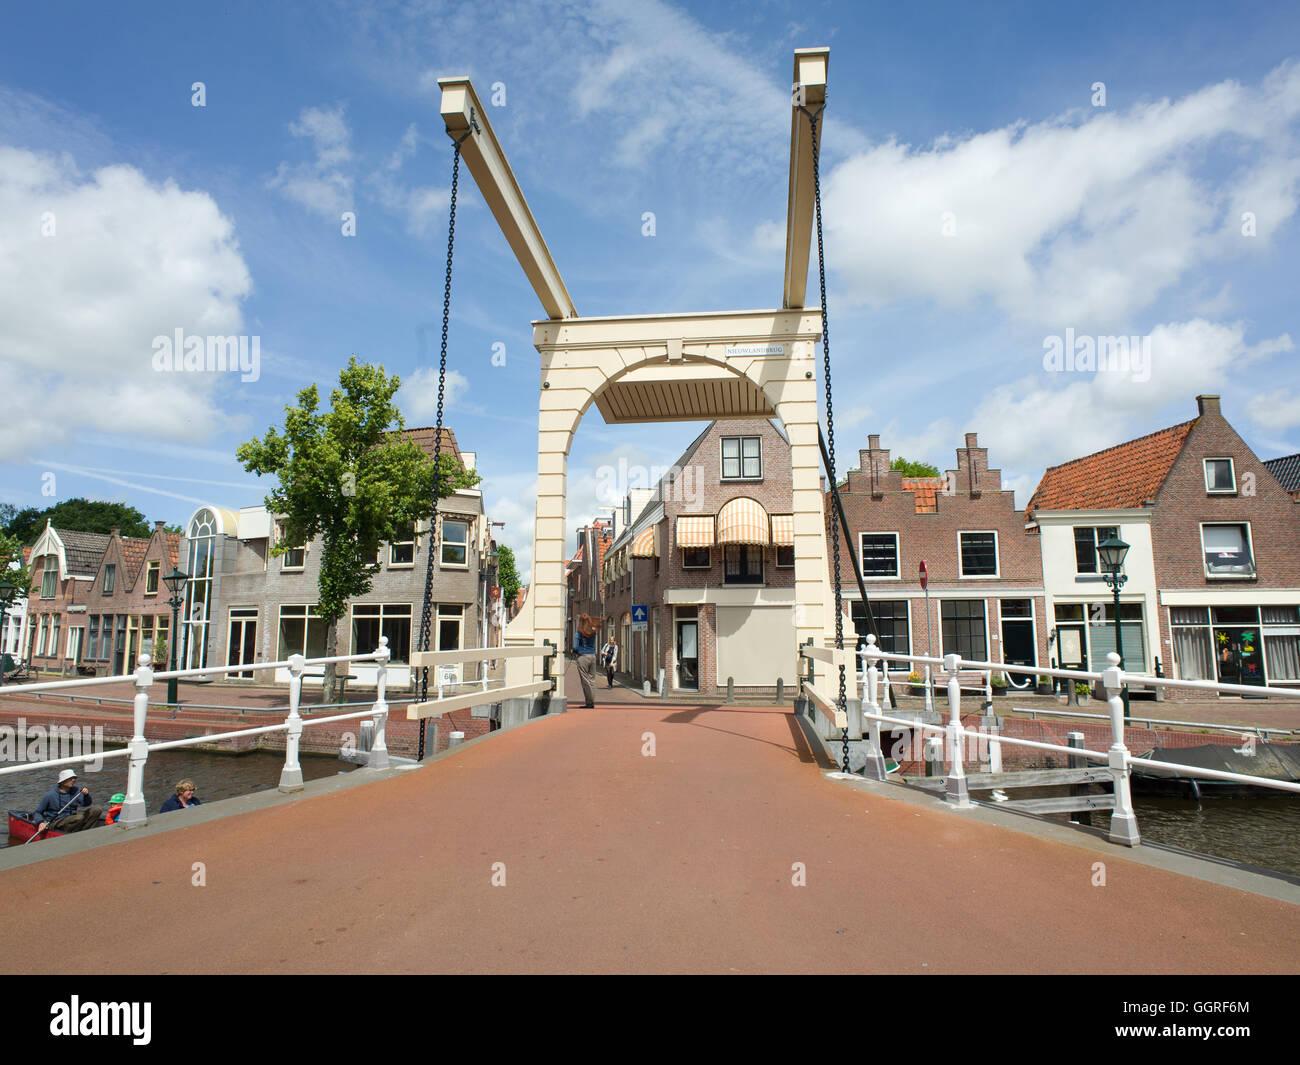 Dutch Cantilever Bridge Alkmaar Holland - Stock Image